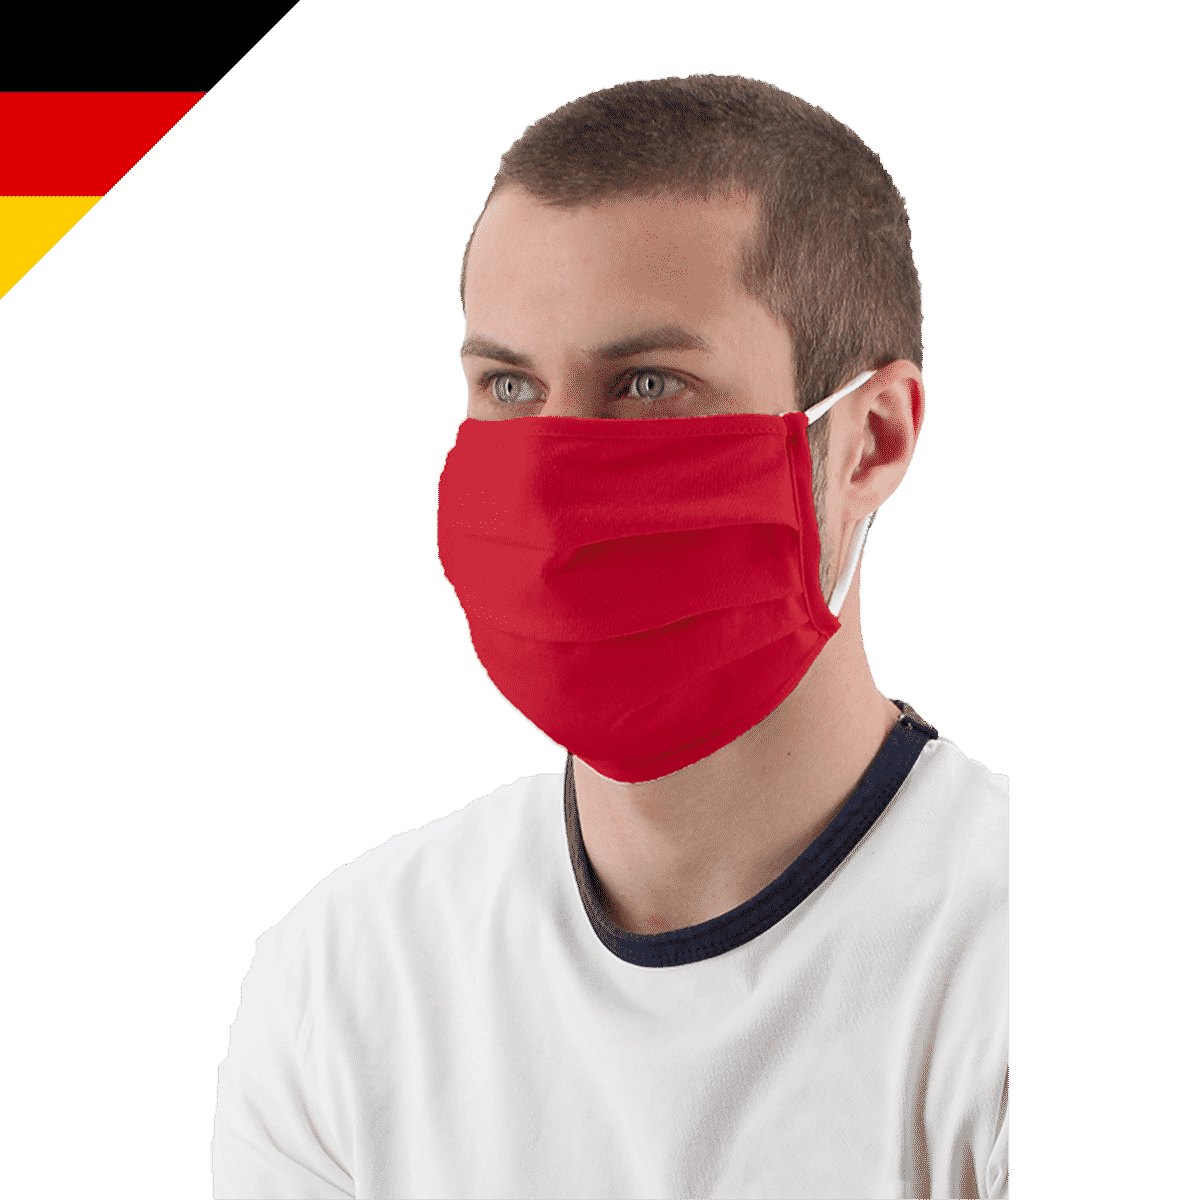 Maske mit Gummi Made in Germany